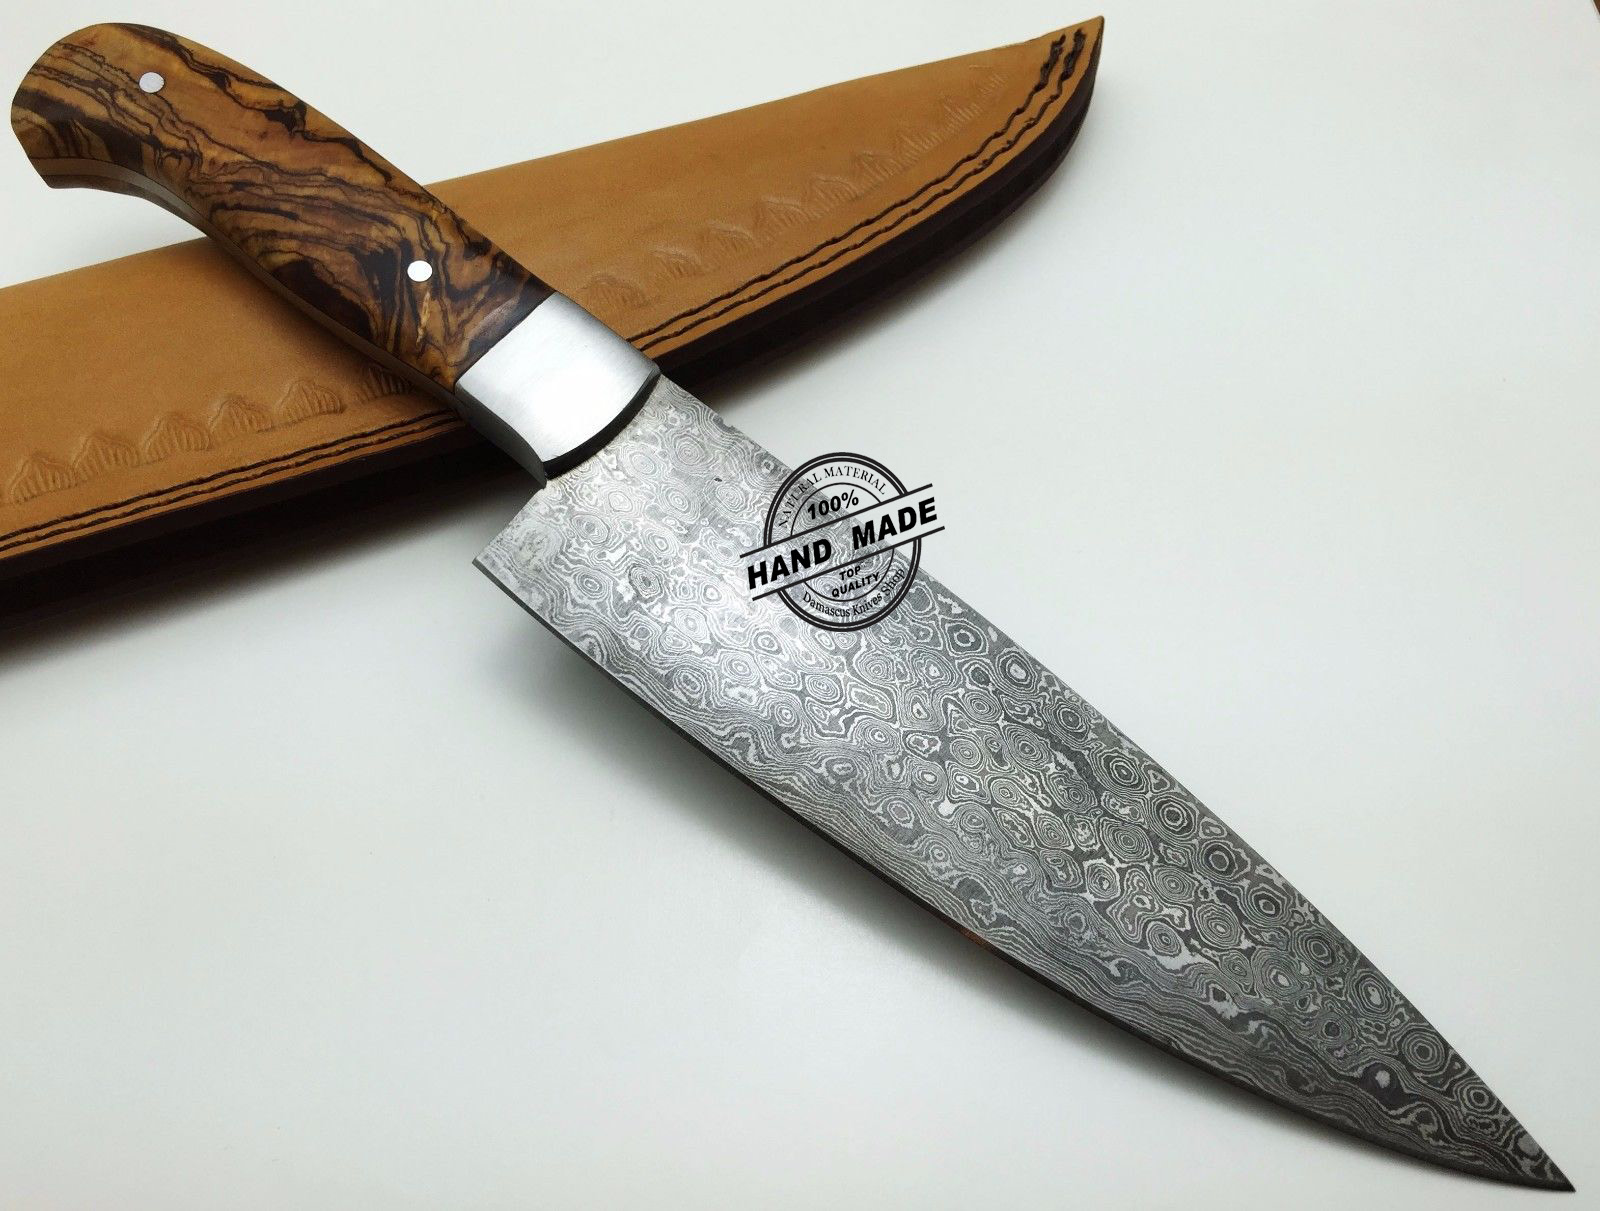 kitchen knife custom handmade damascus steel kitchen chefs knife mar kitchen knives prestigedges kitchen knives boker kitchen knives ja